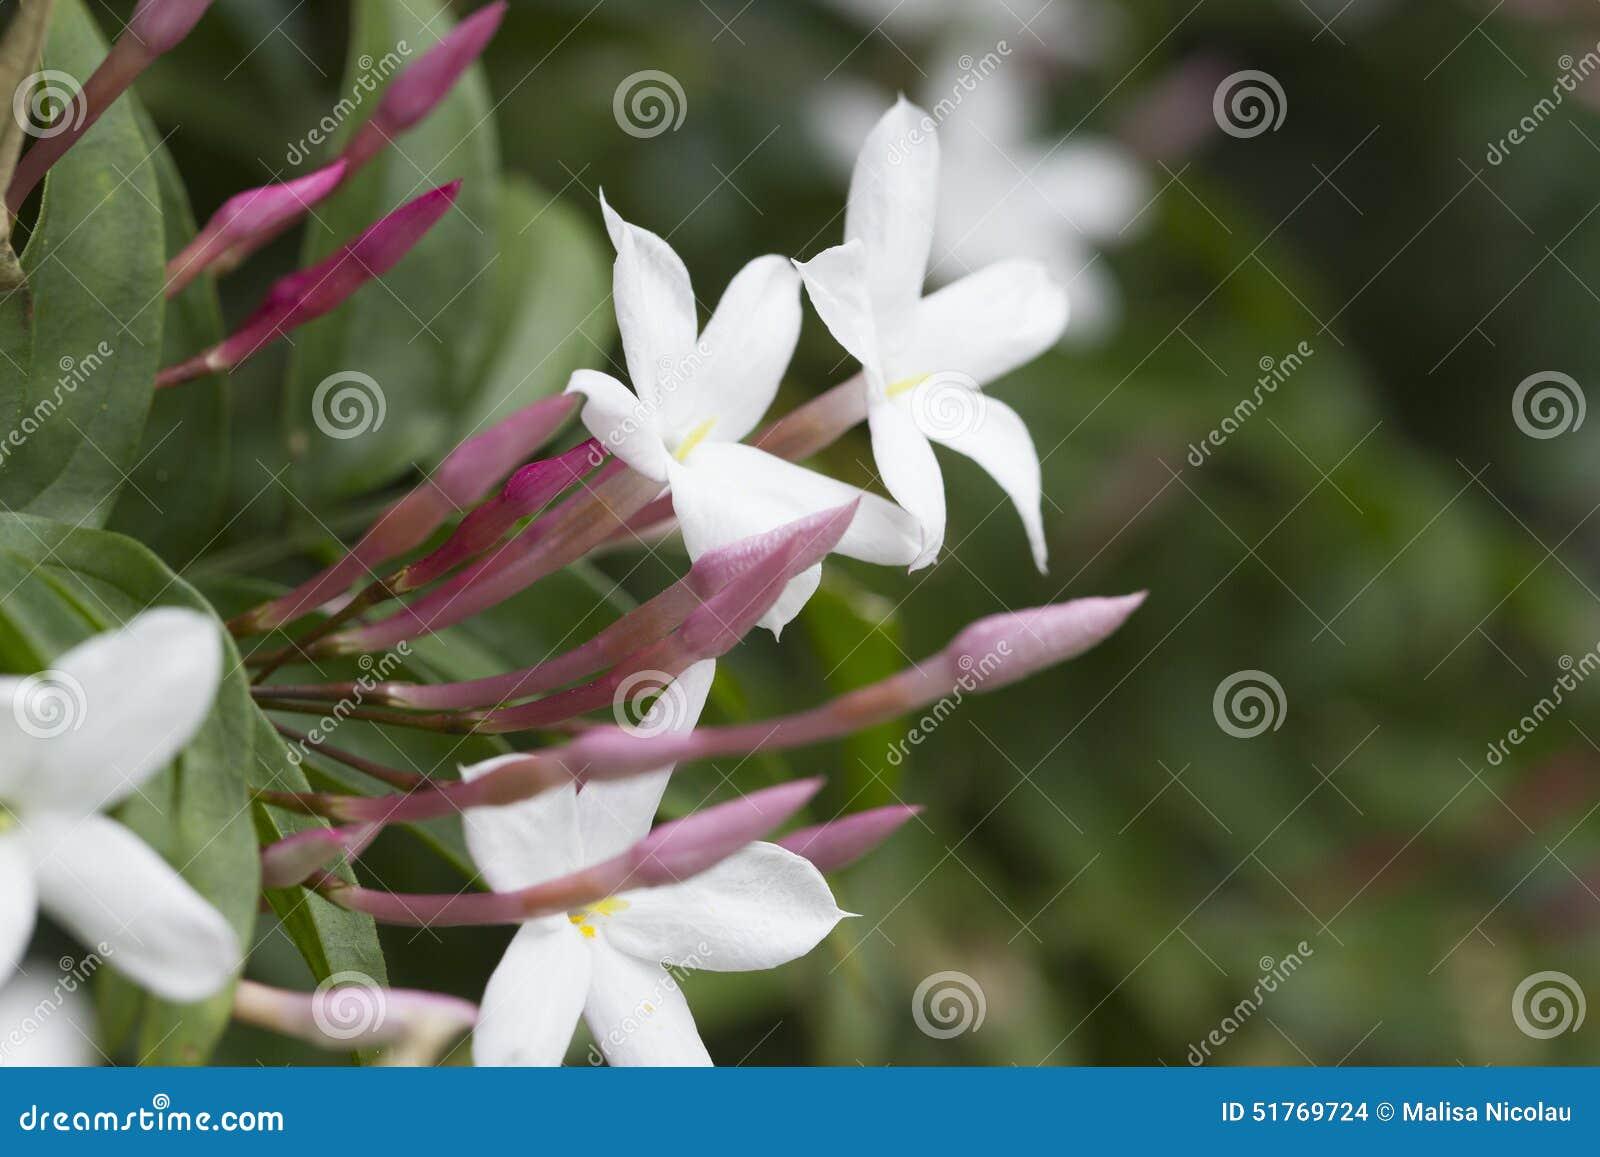 Star Jasmine Plant Stock Photo Image Of Jasminoides 51769724